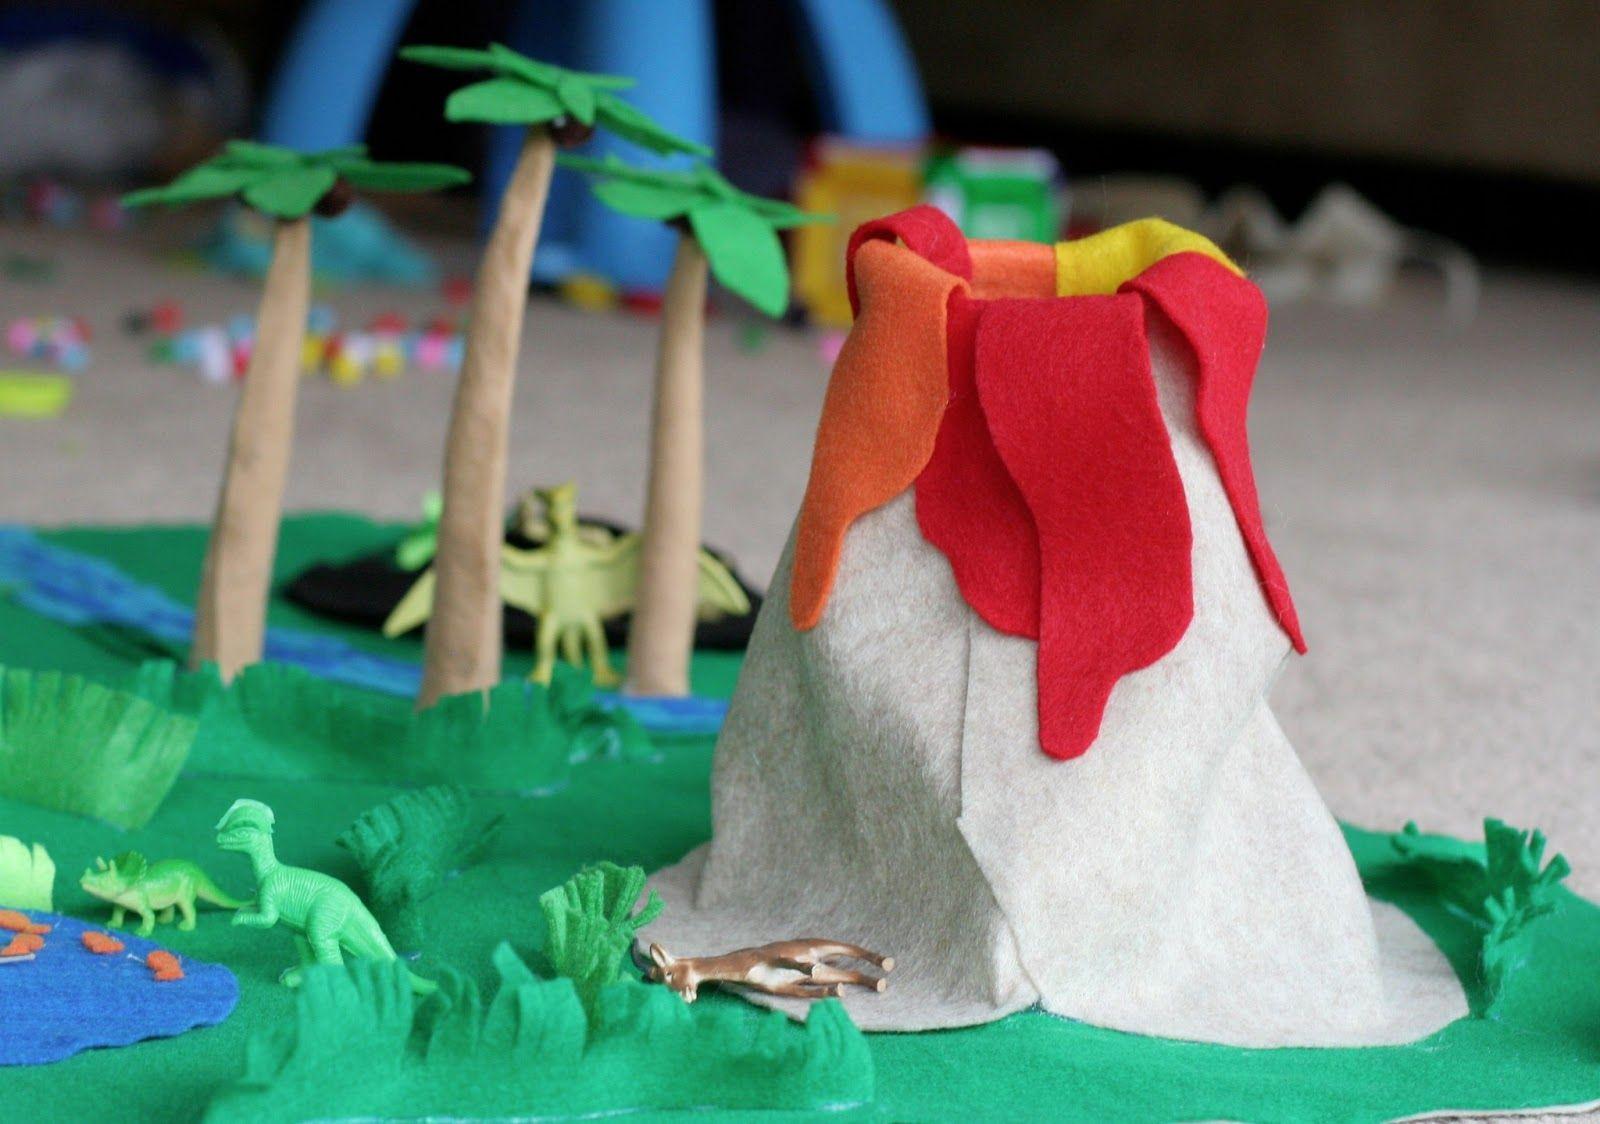 No Sew Dinosaur World Playmat Diy Gifts For Kids Dinosaur Play Creative Diy Gifts